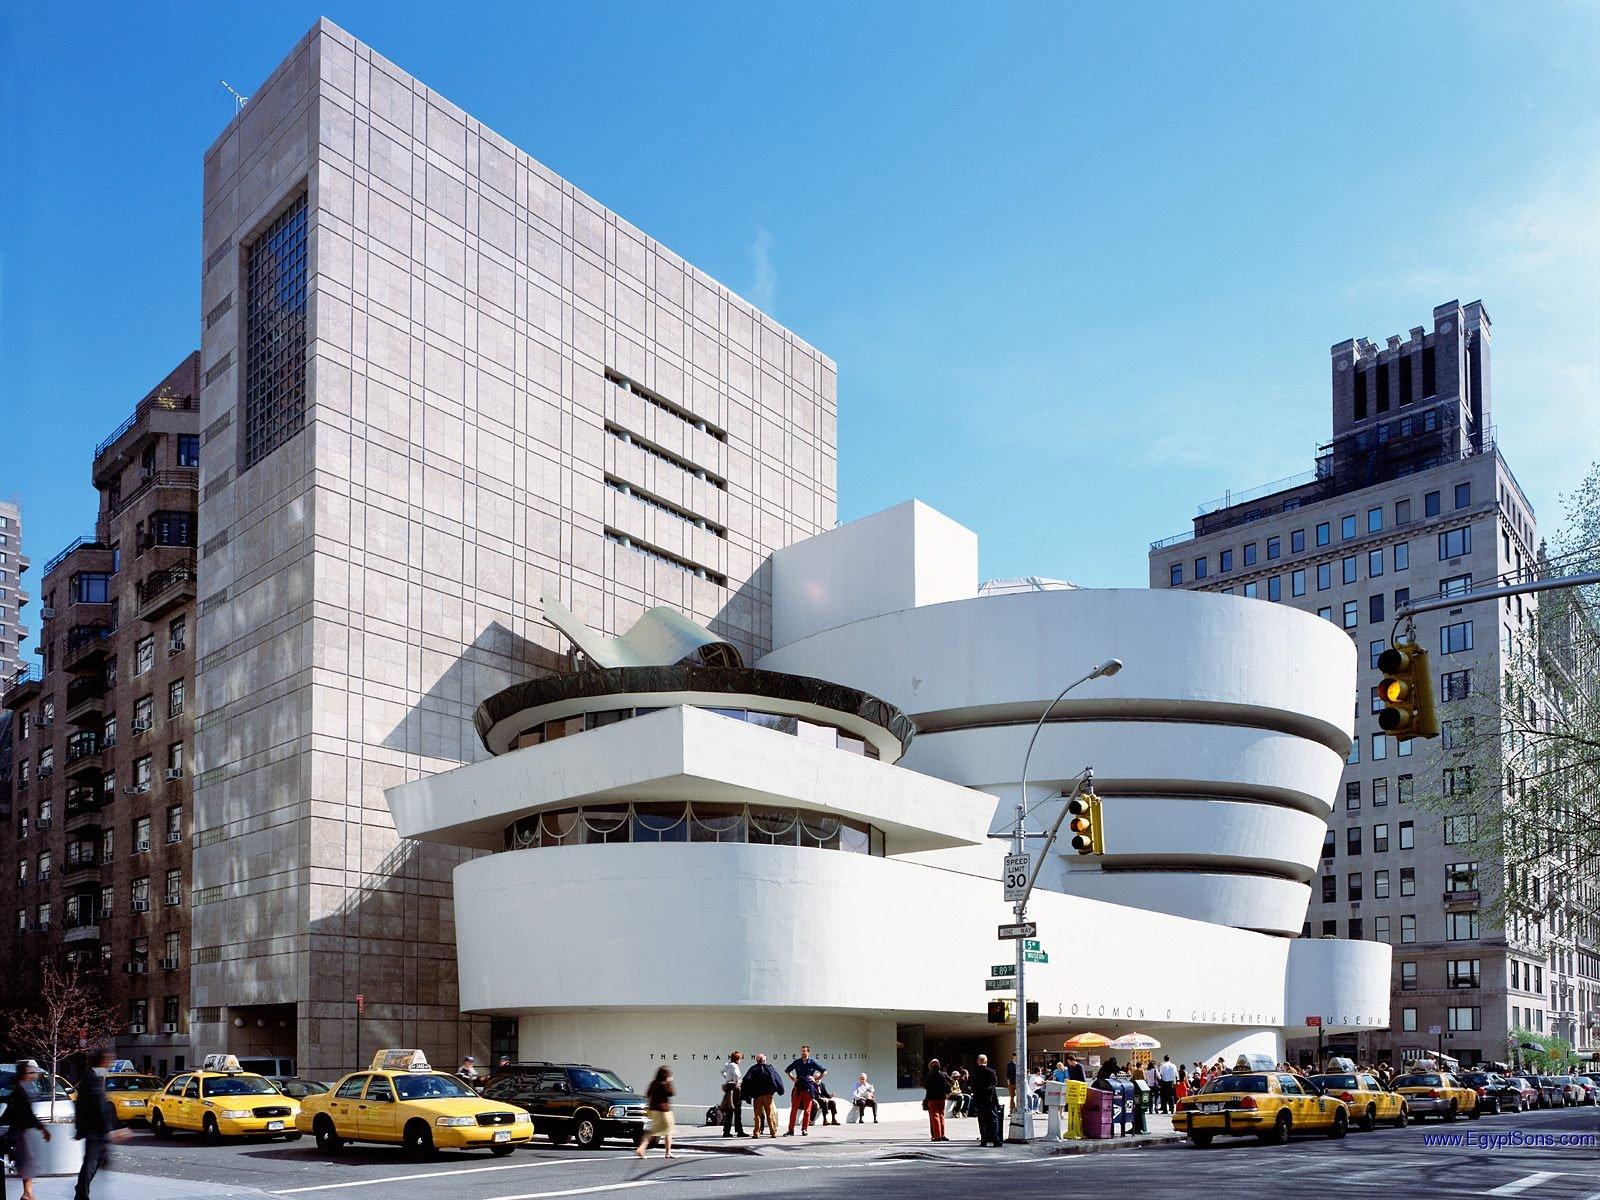 Guggenheim Visit The Arts In NYC Art Upstairs Downstairs